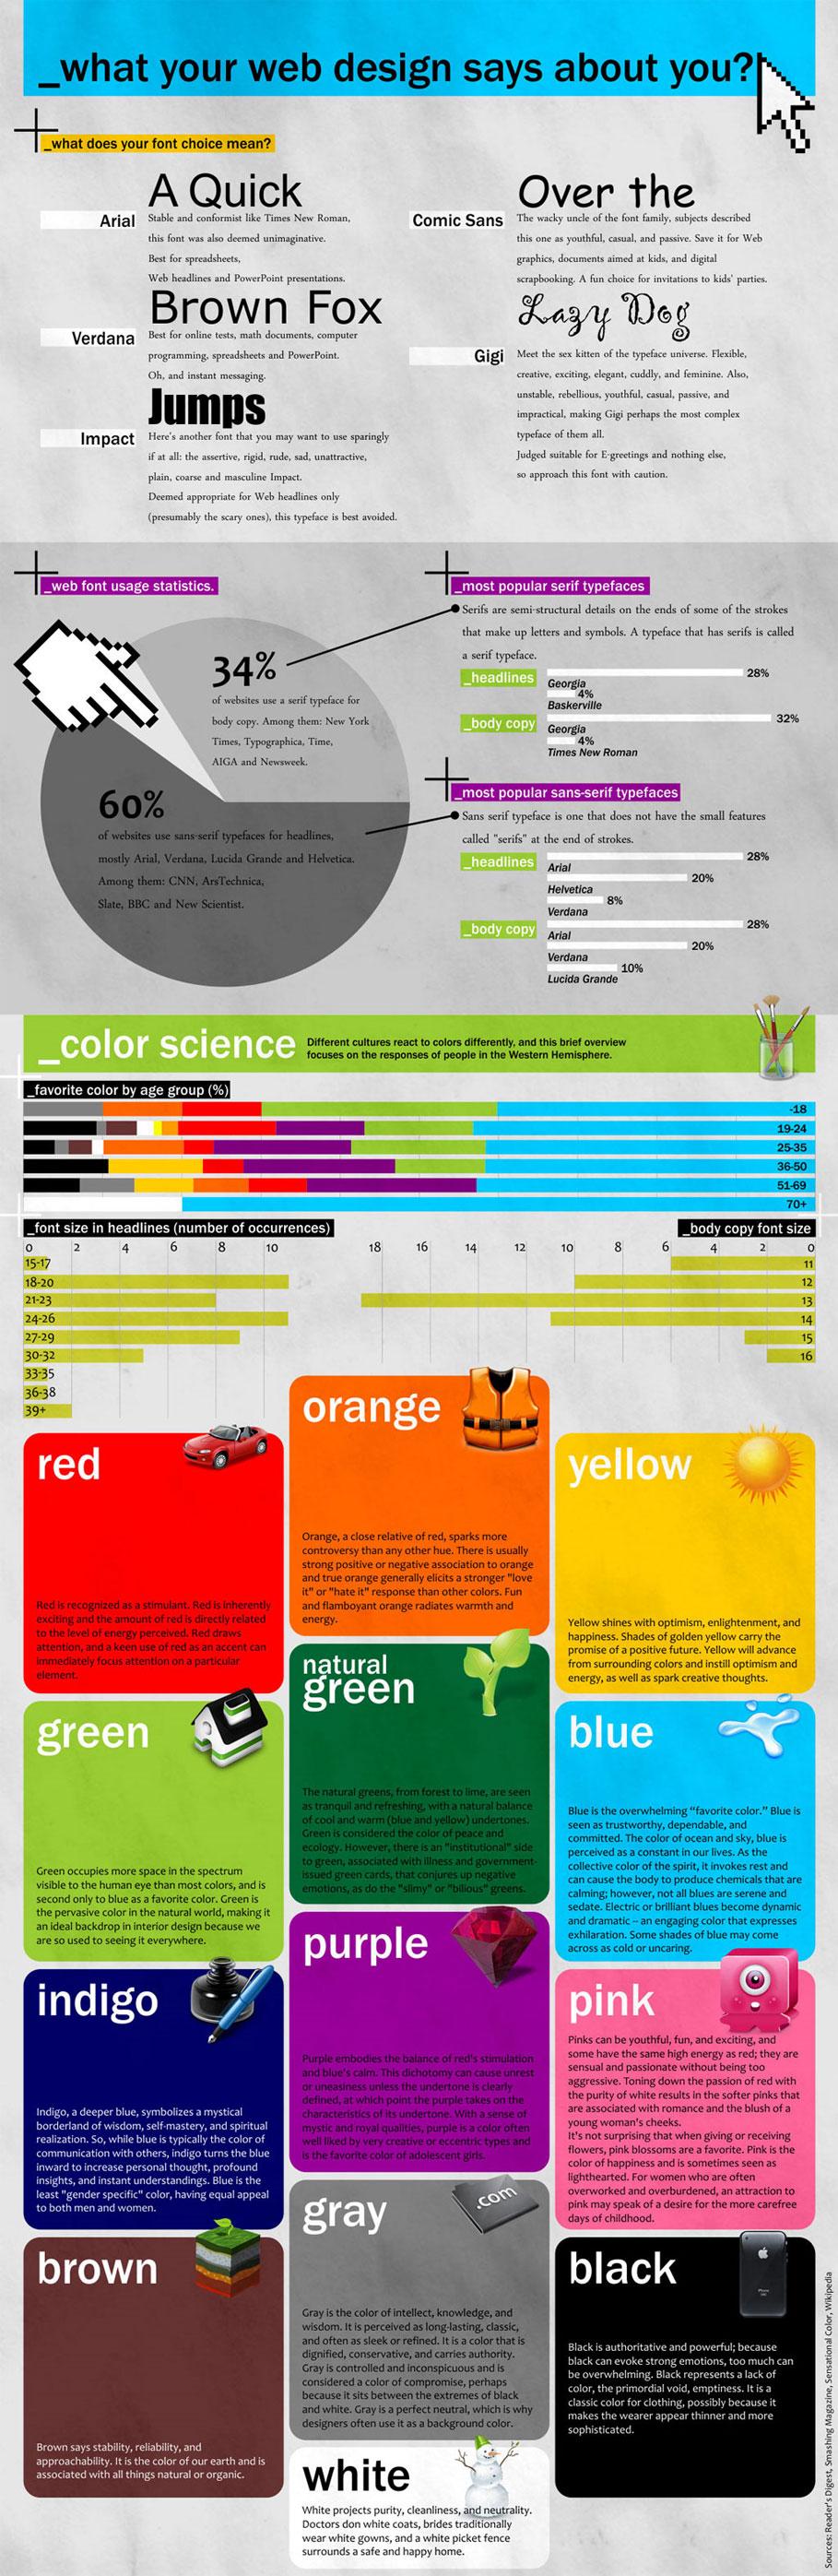 Nice infographic design